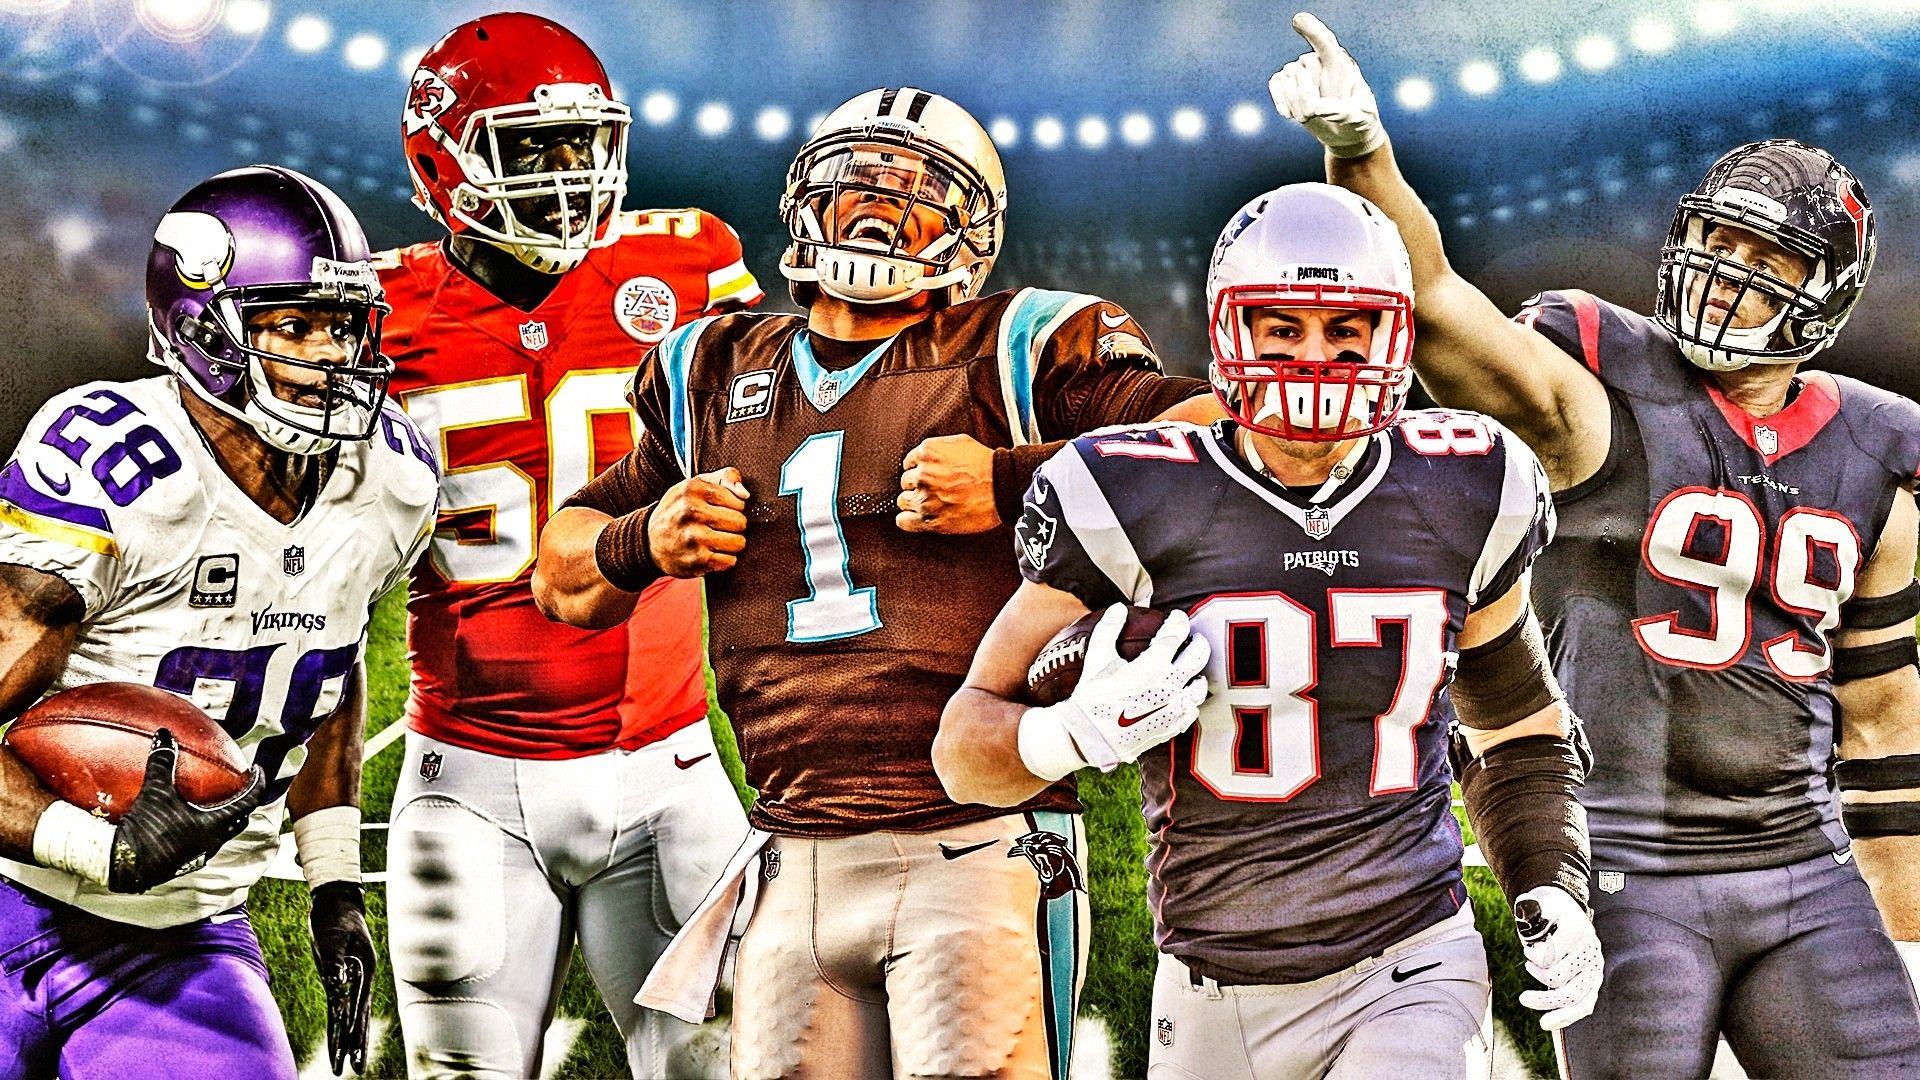 Live https//freenfl.live/live NFL Live Streaming, Watch